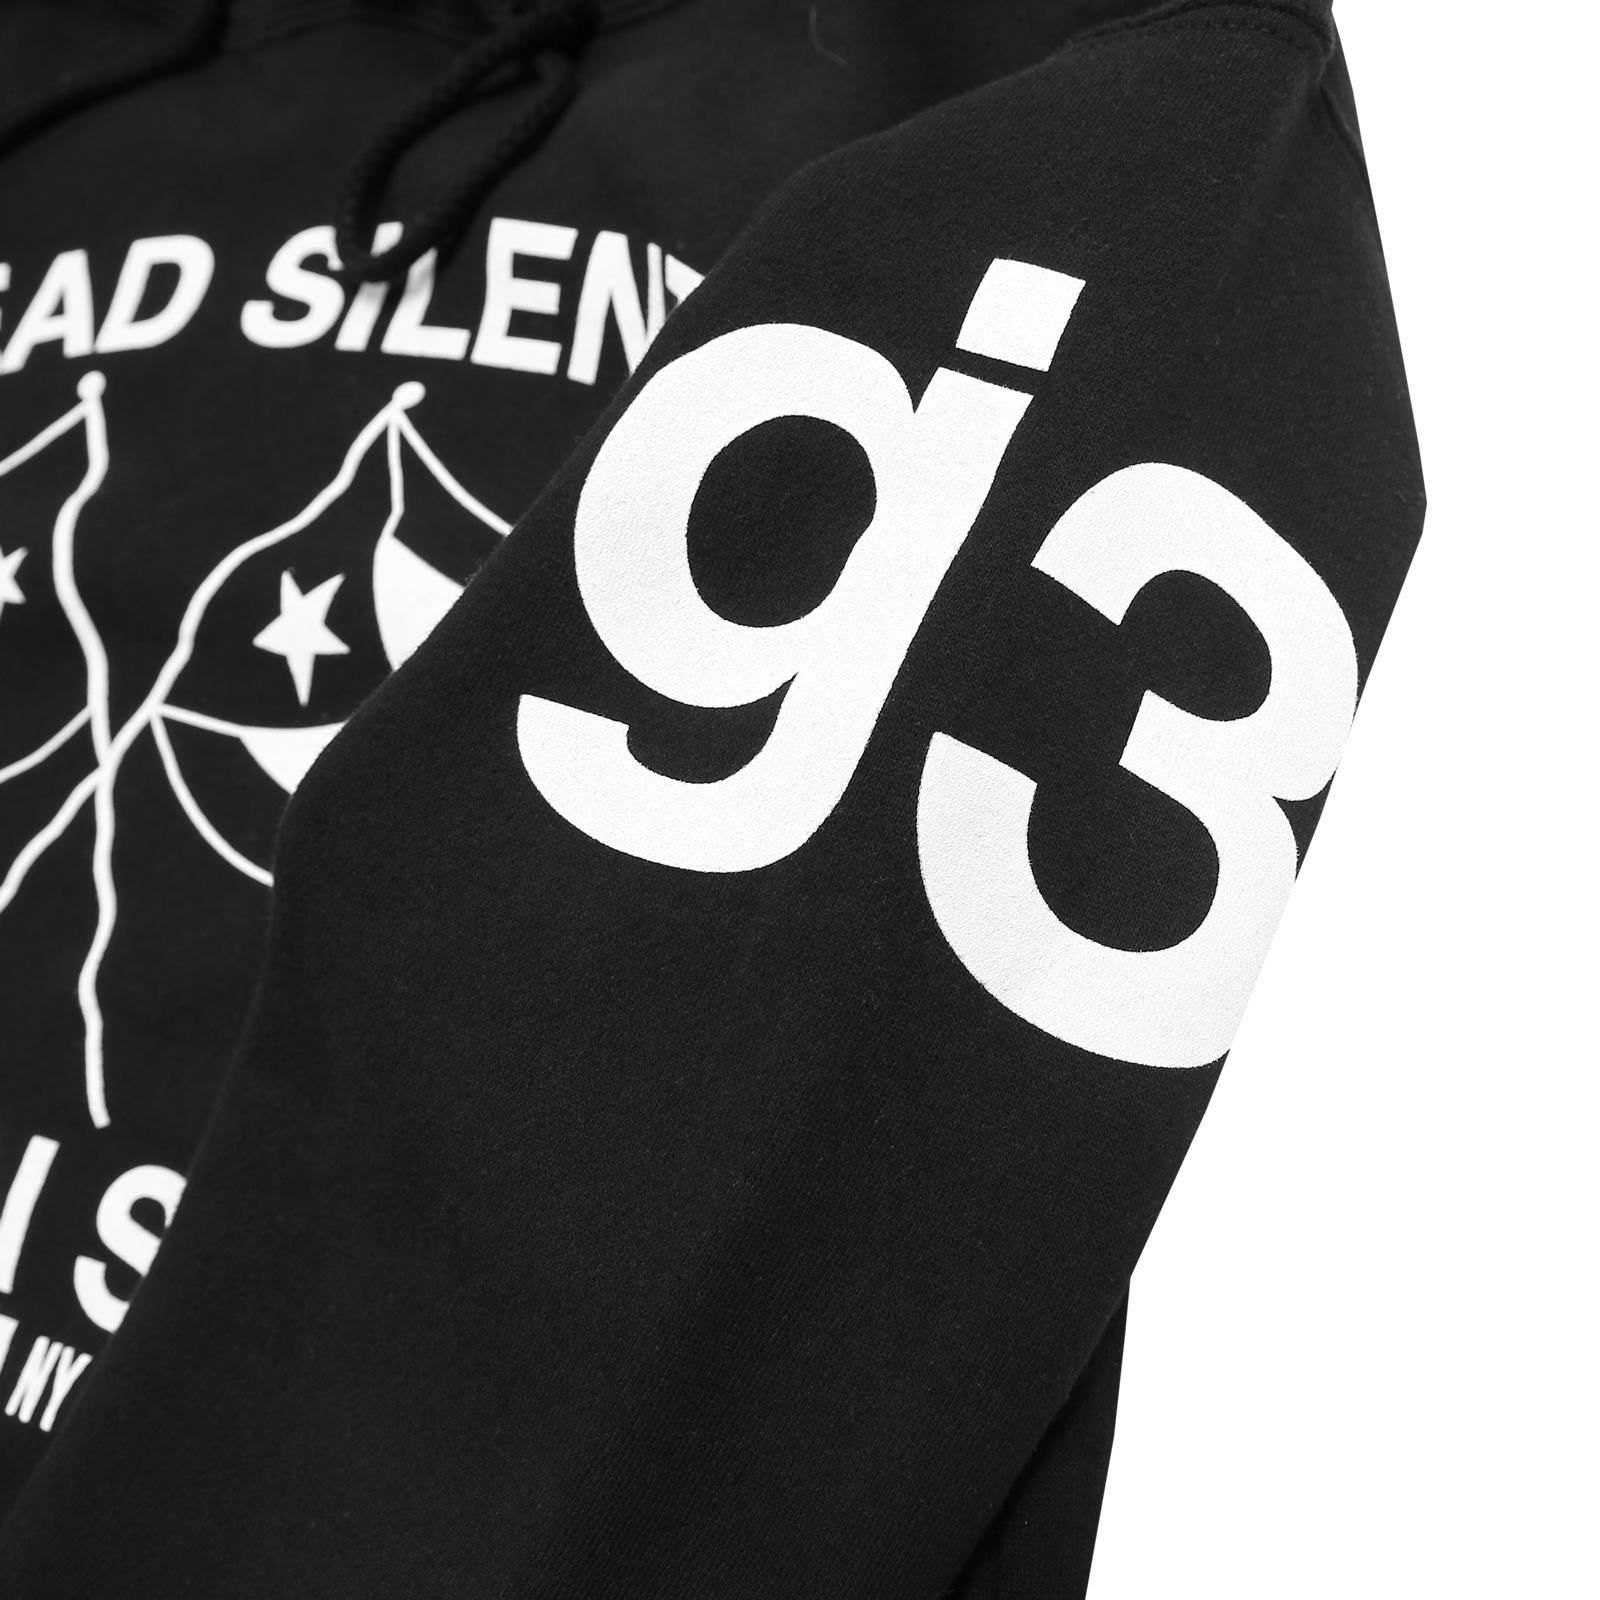 Dead Silent Black Pullover